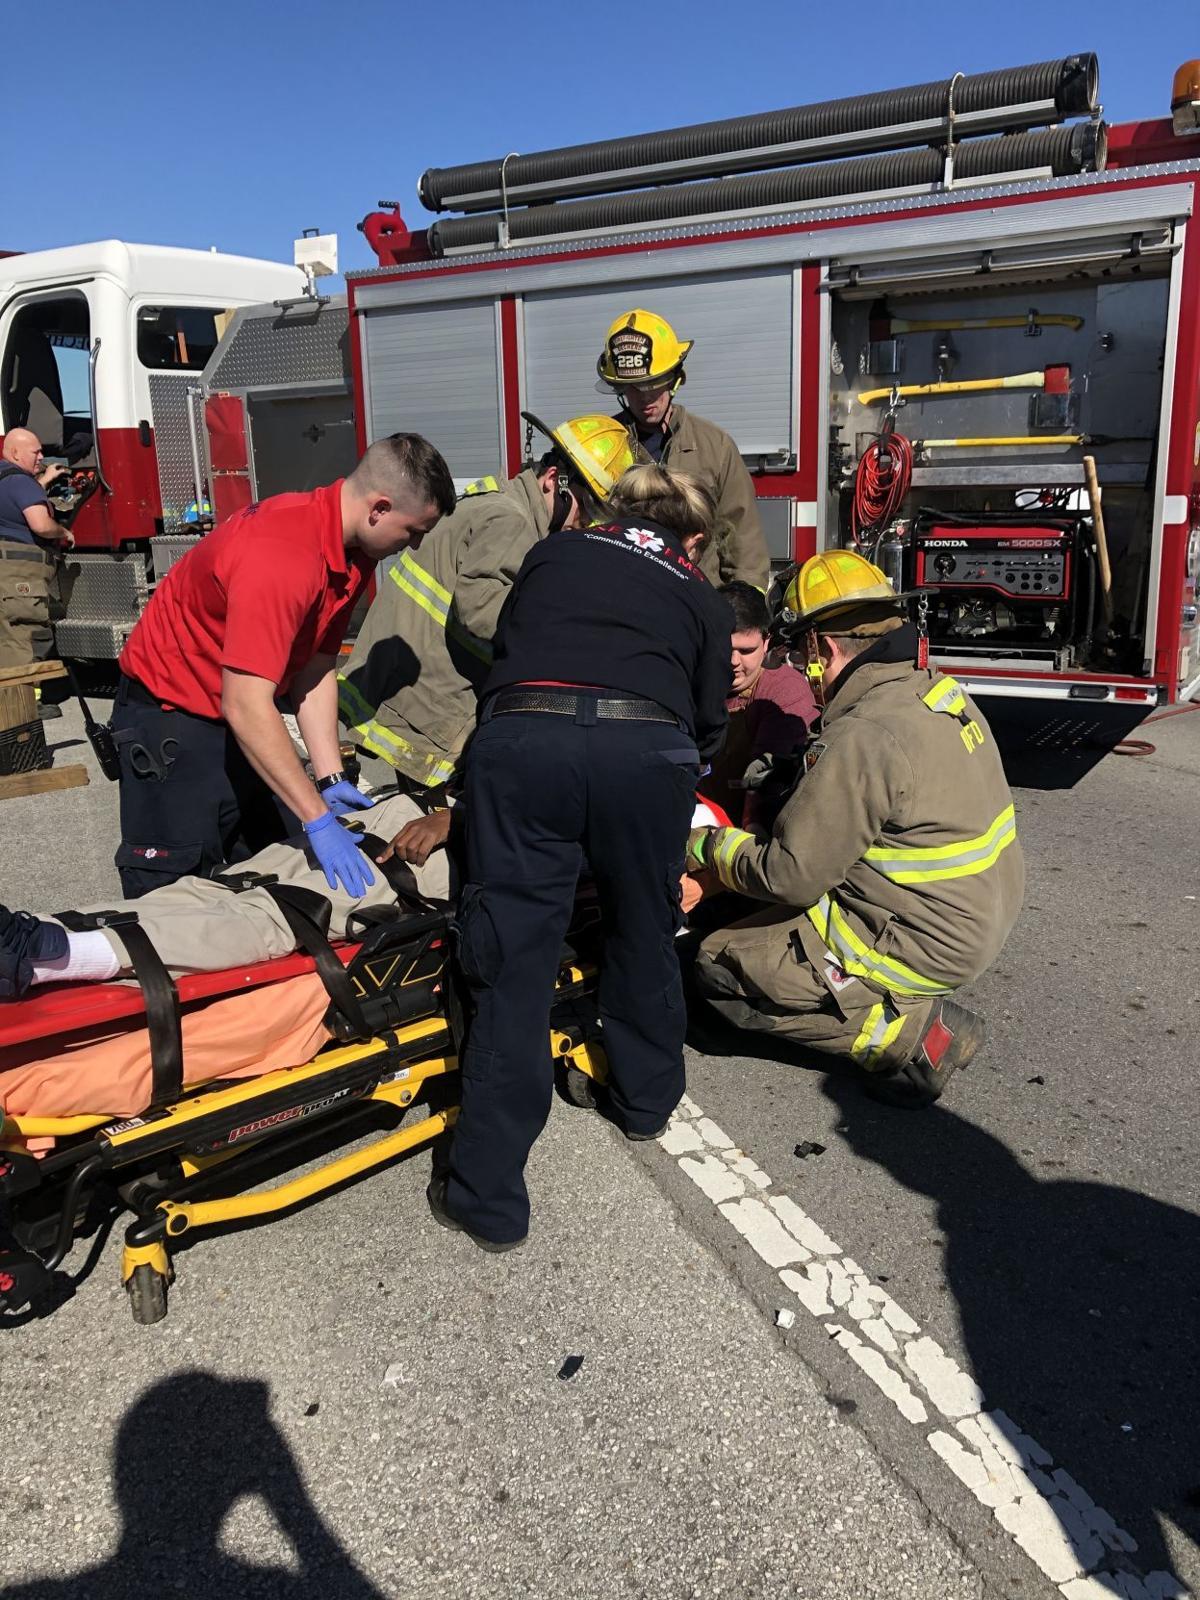 A&E Emergency Services LLC and Decherd pic